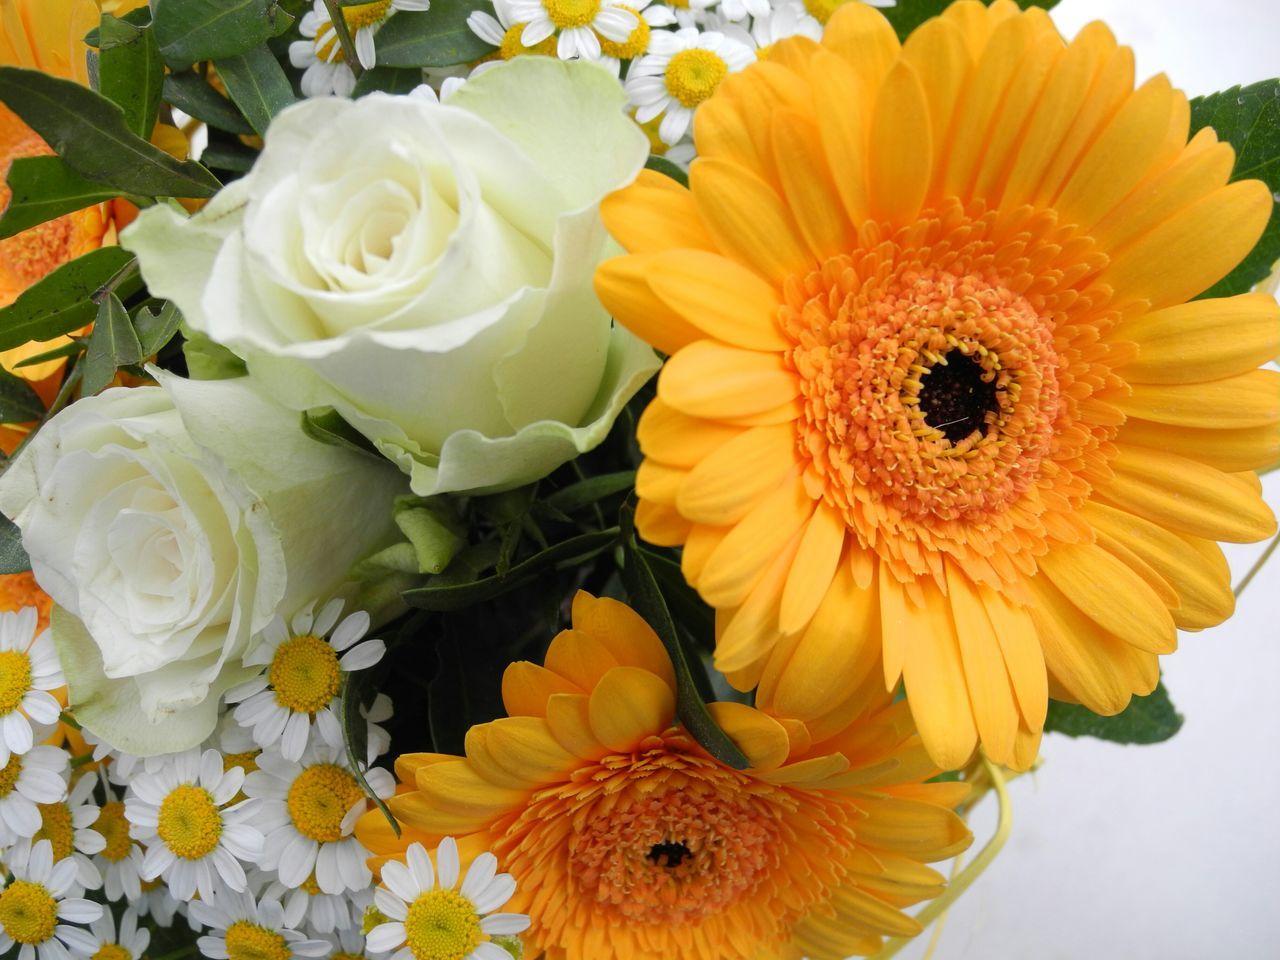 Flower Bouquet  EyeEm Best Shots - Flowers Birthday Flowers Flower Photography Bouquet Of Flowers Bouquet Flower Collection